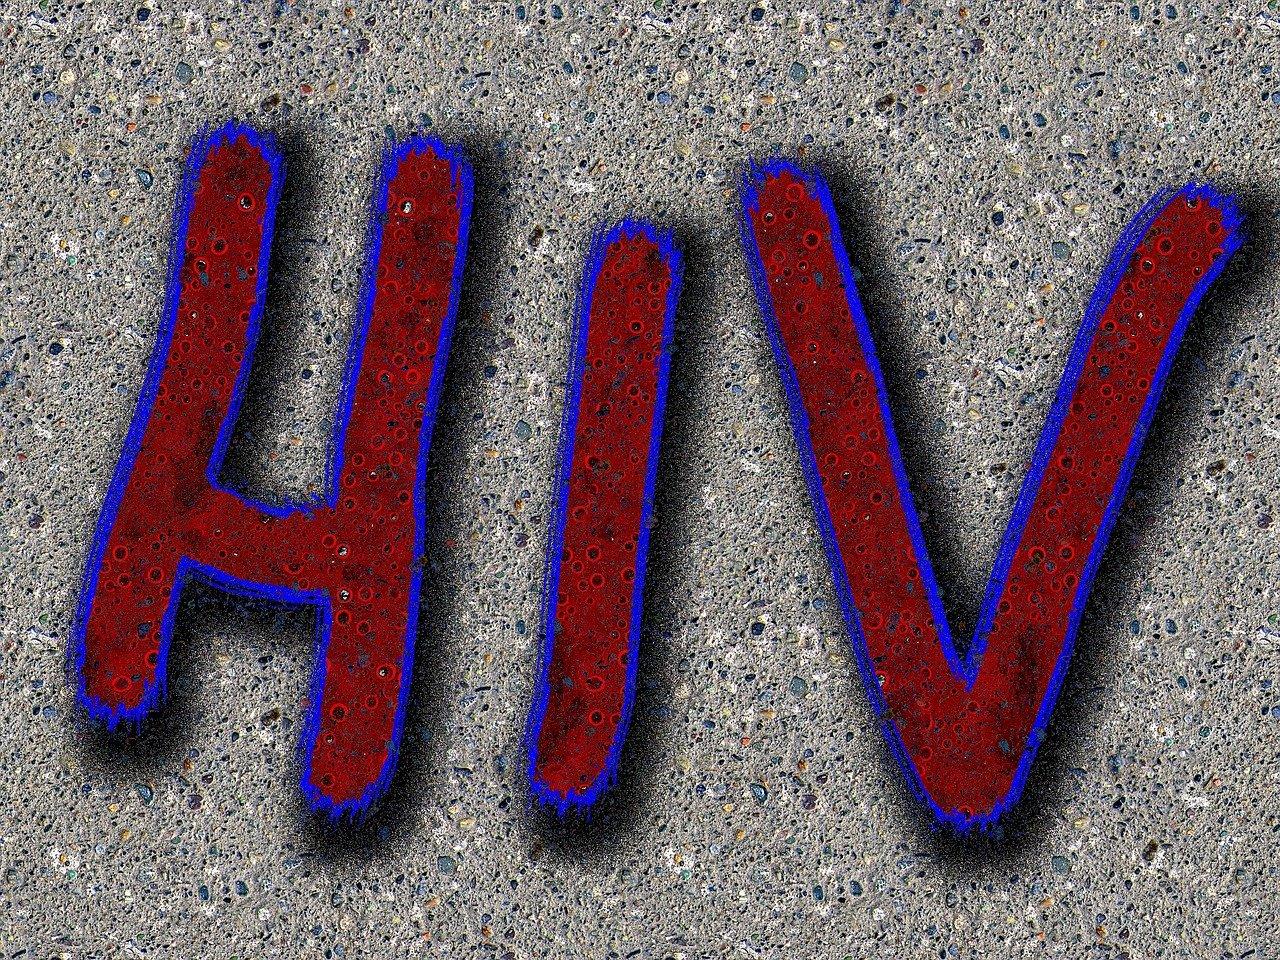 Mycoplasma Genitalium Bacterial STD Leads To Potential HIV Image